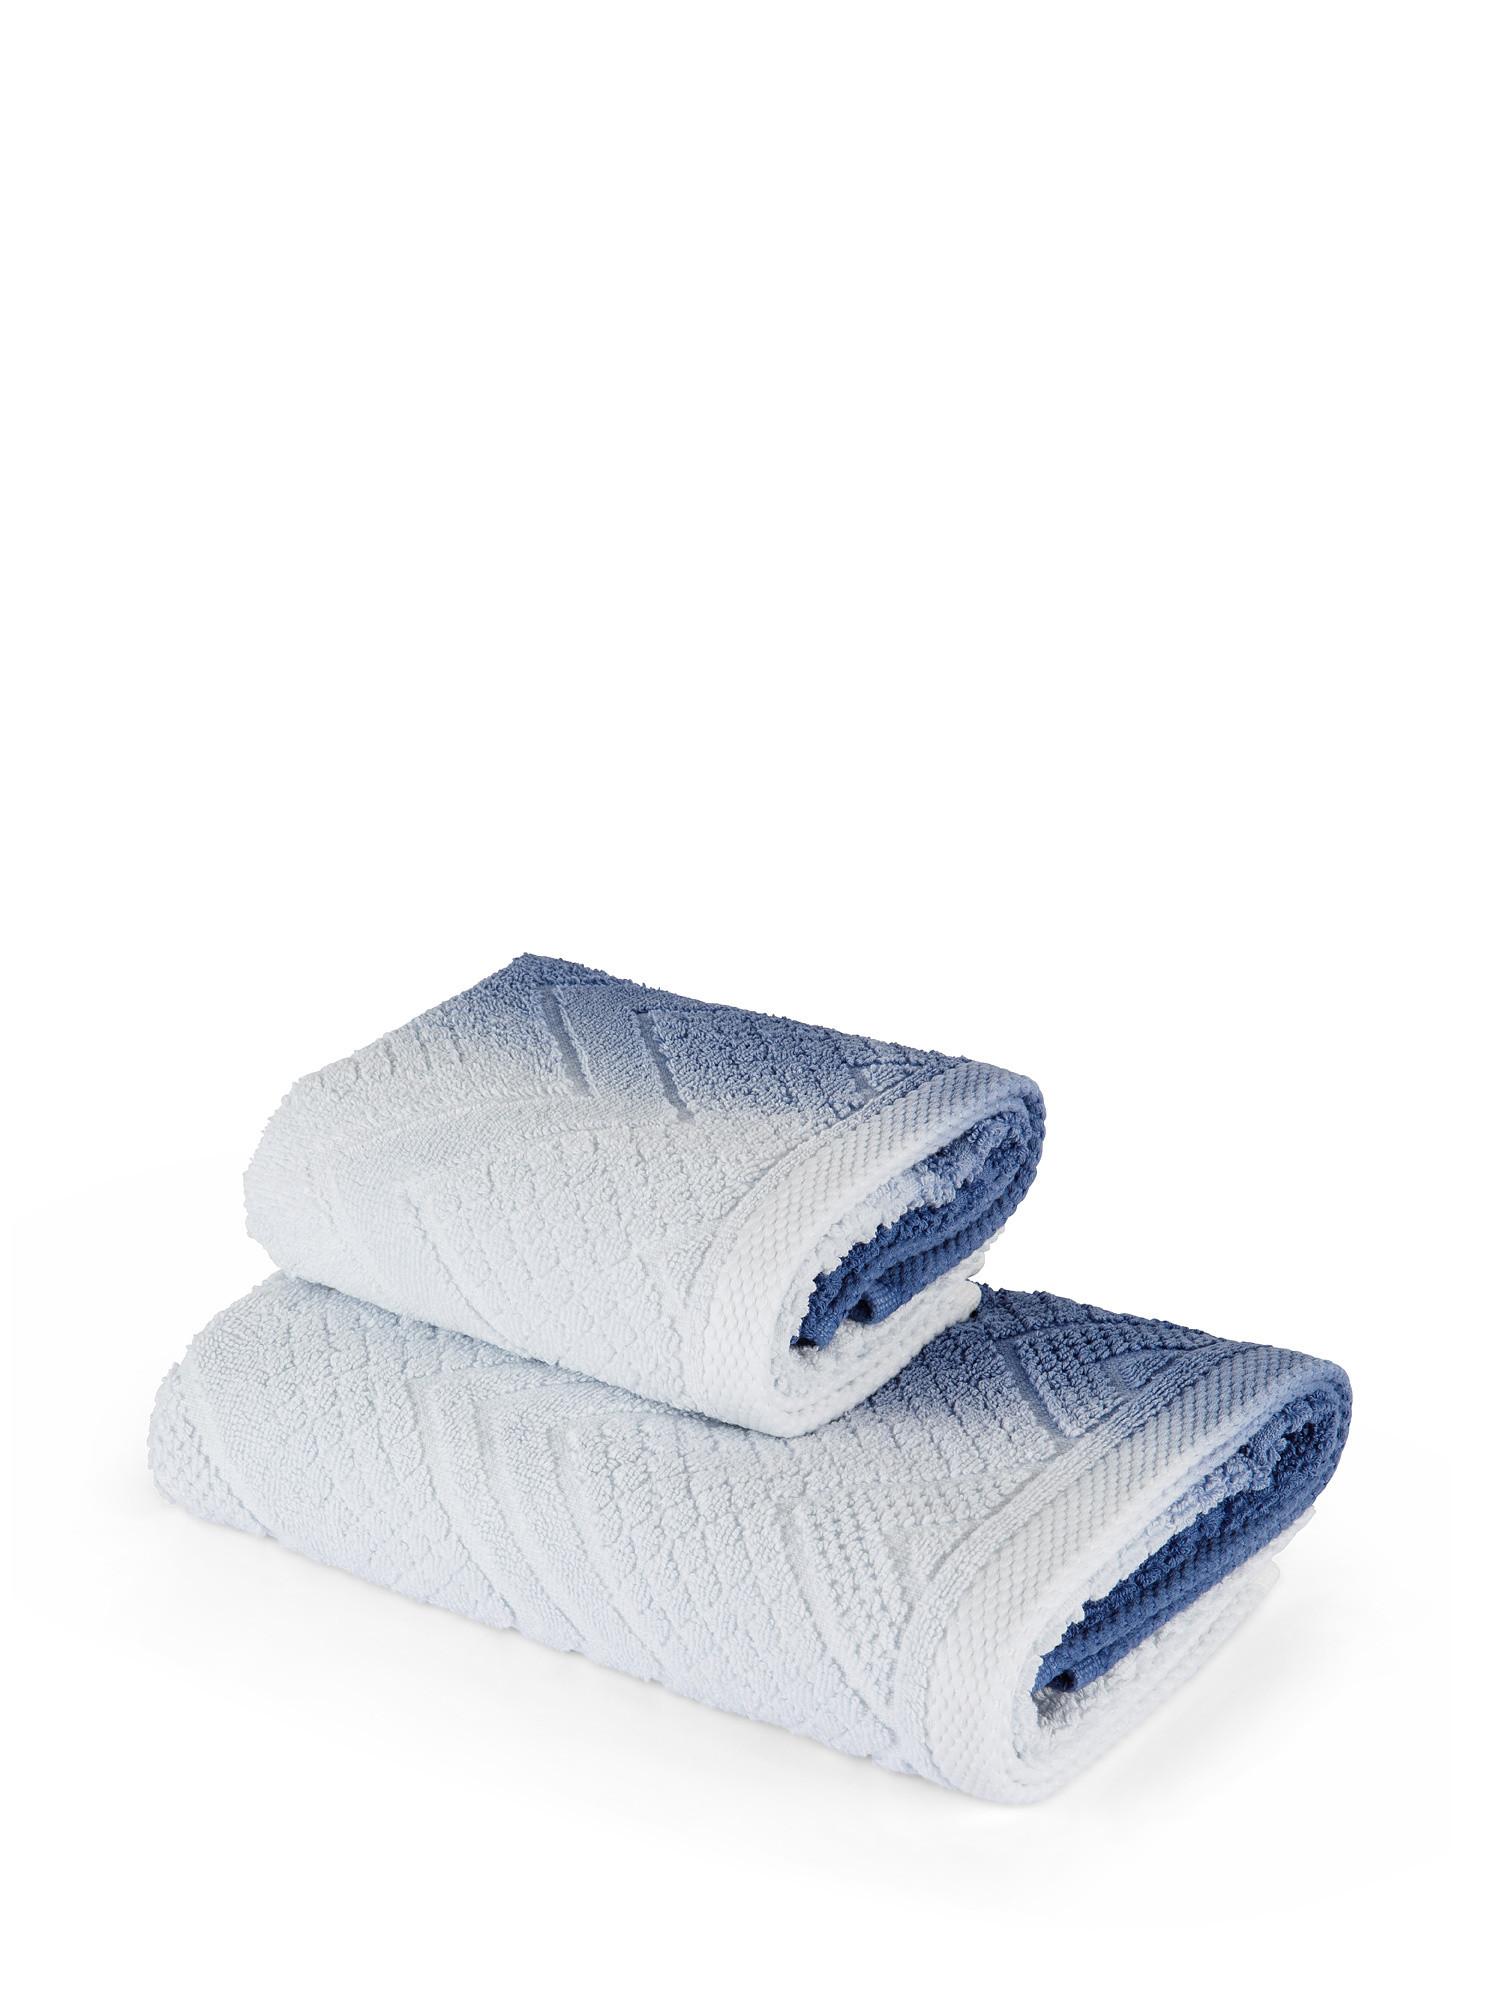 Asciugamano spugna di cotone dip dye, Blu, large image number 1